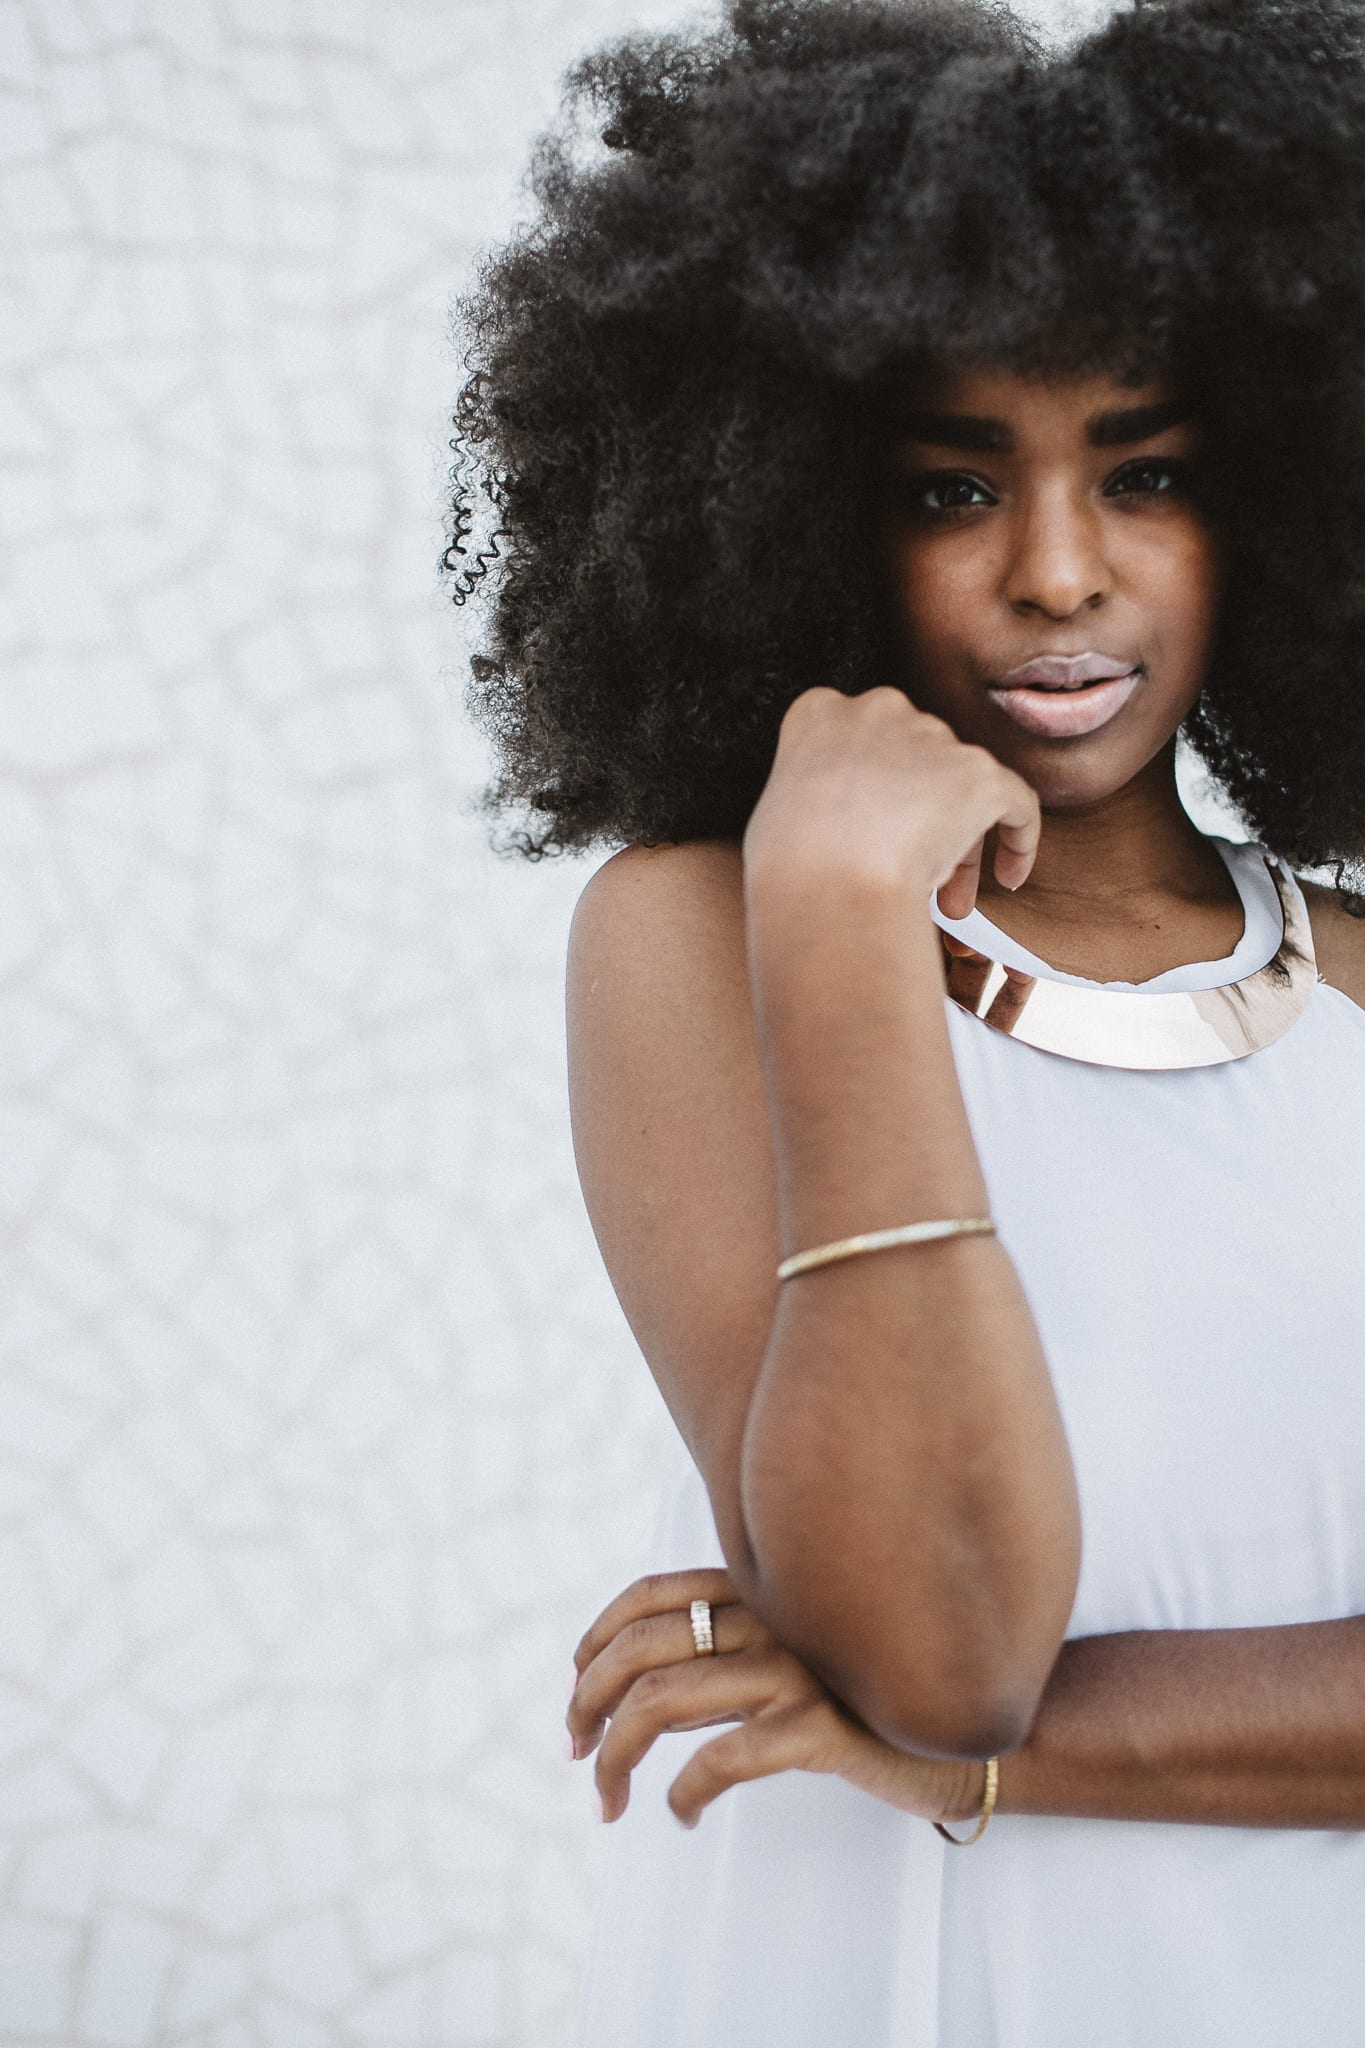 sundial-bridge-california-portrait-photographer-black-afro-queen-birthday-9